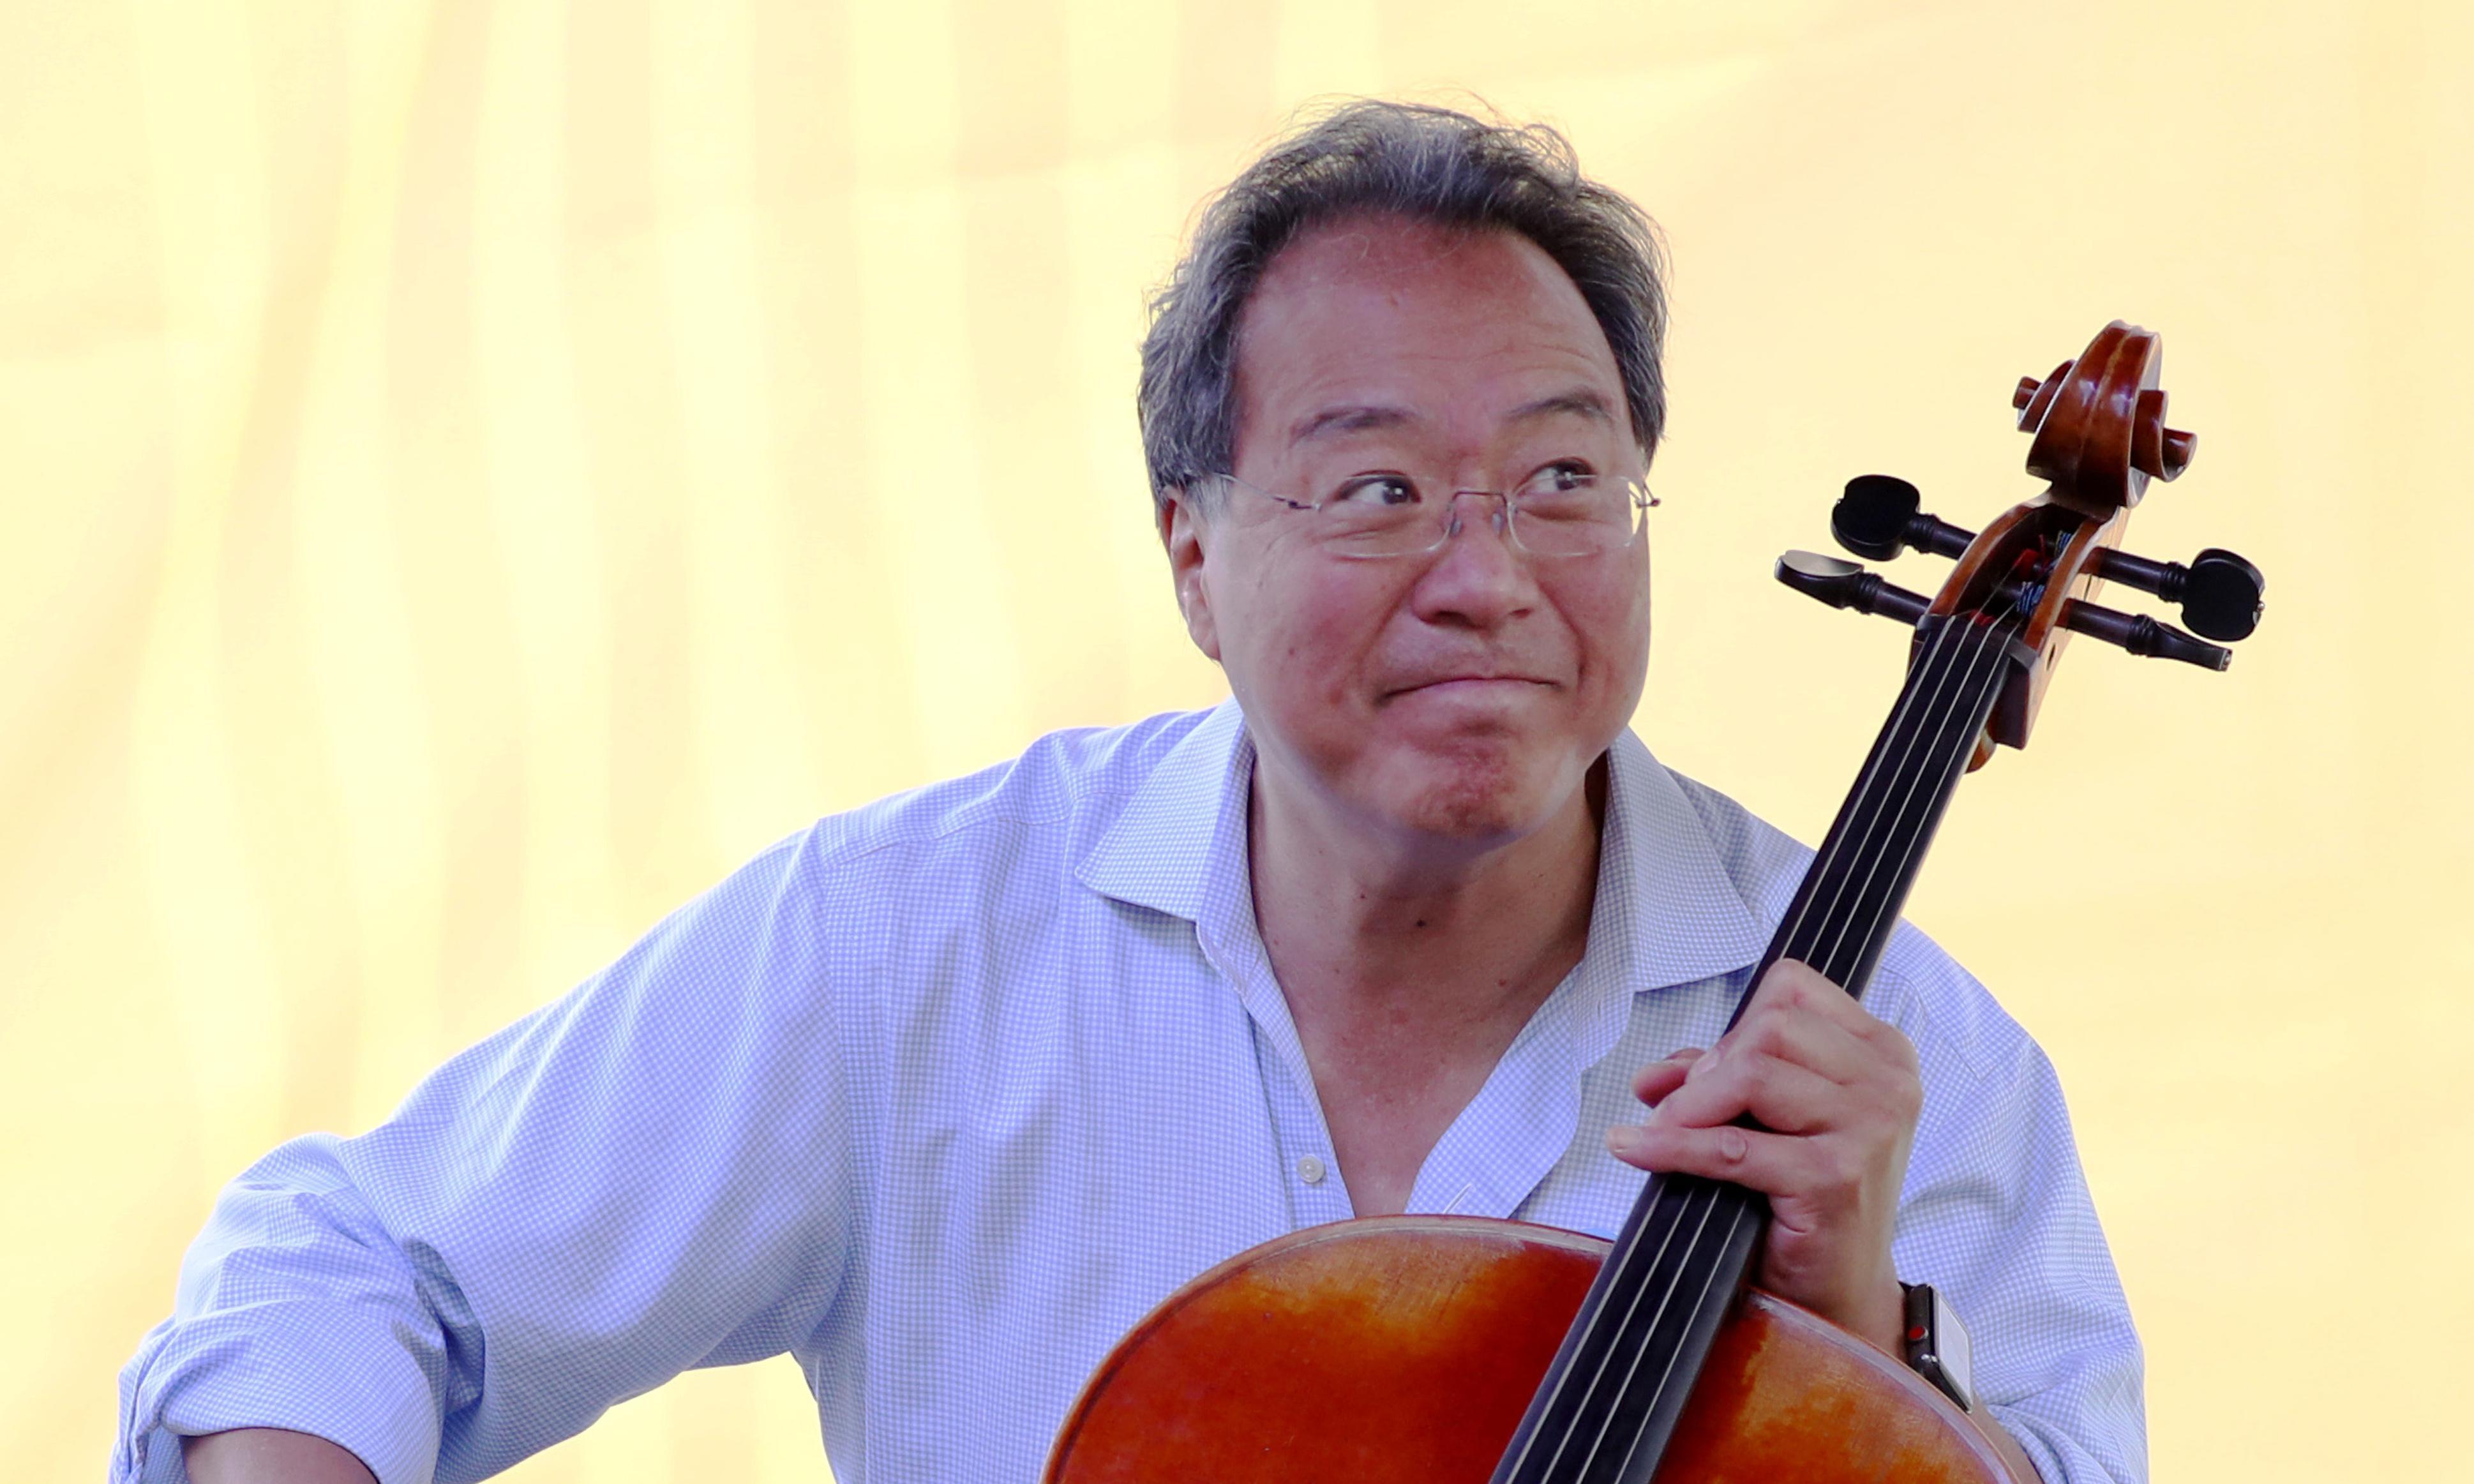 How to watch virtuoso cellist Yo-Yo Ma's first concert in Australia